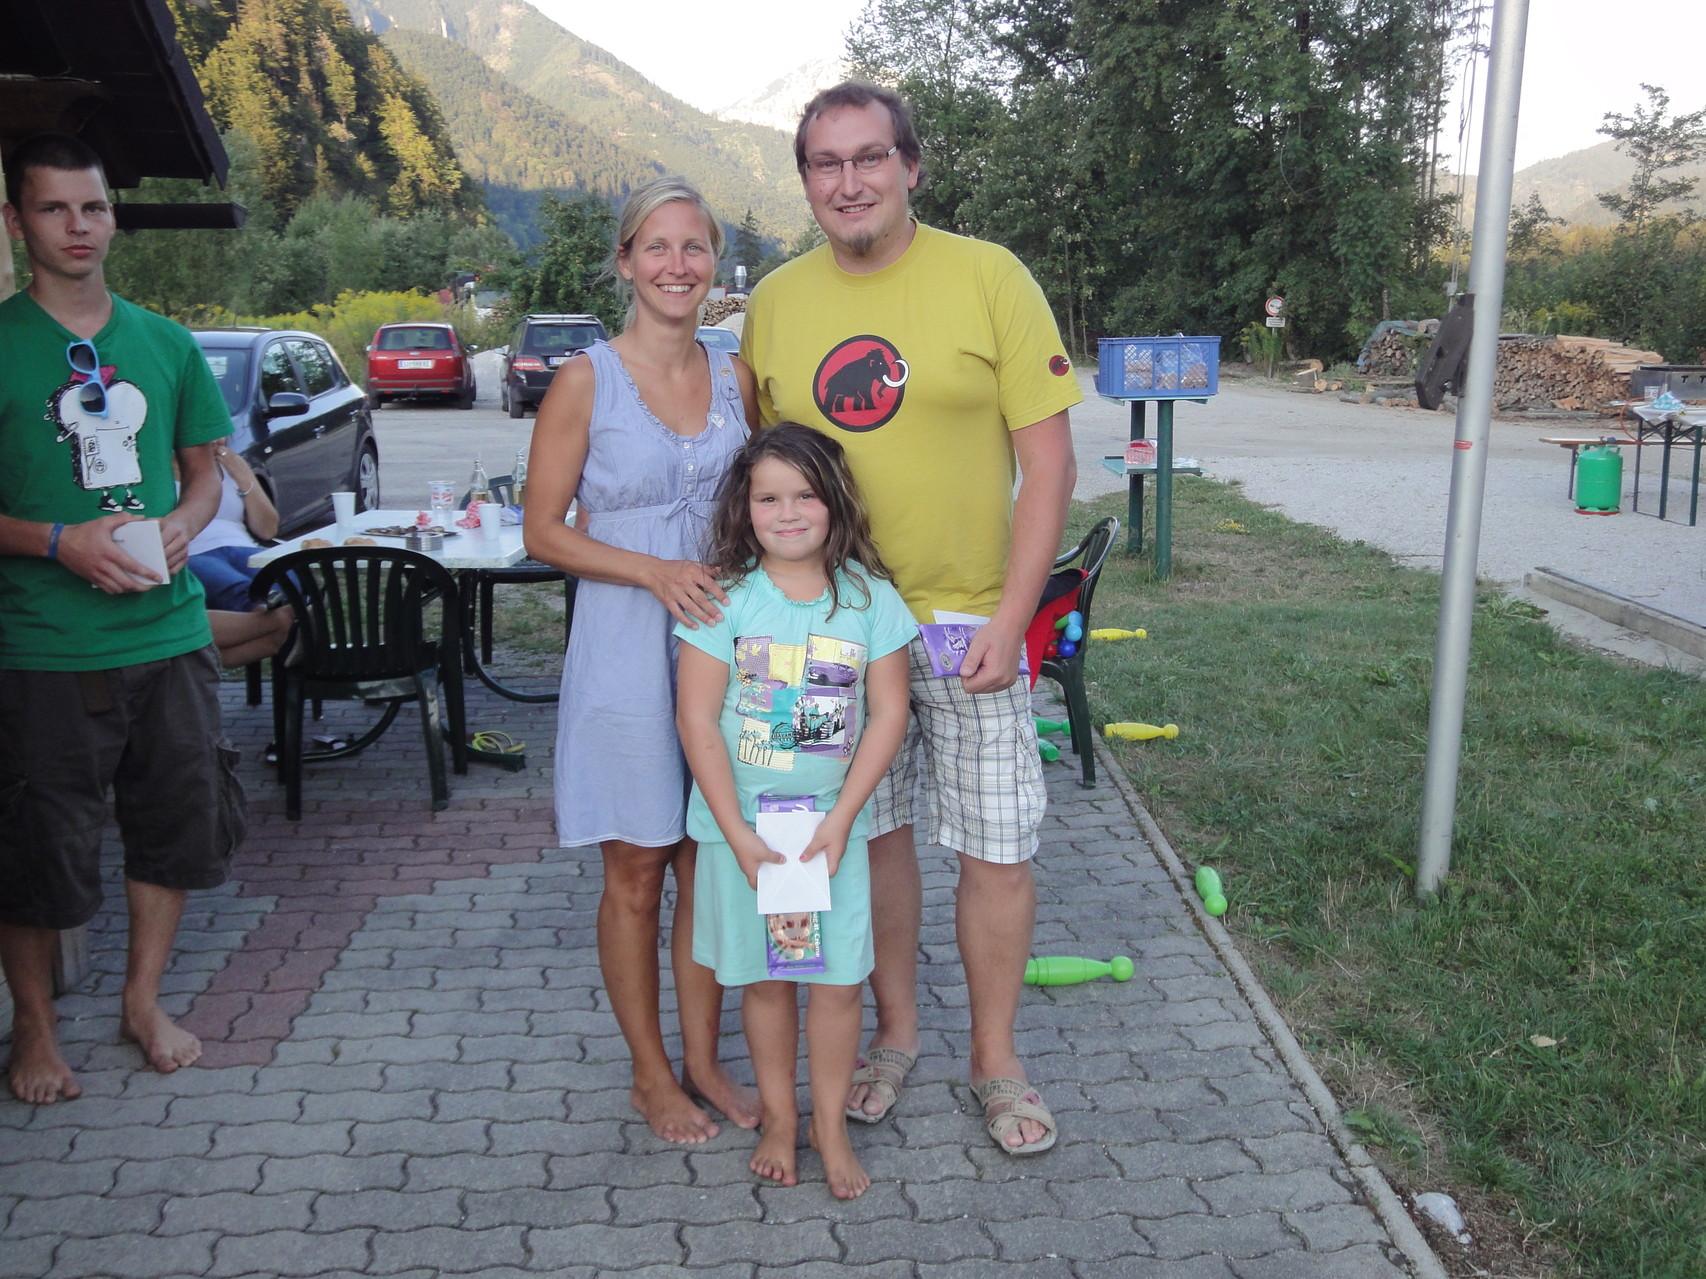 Team Helgrit, Michael, Fiona